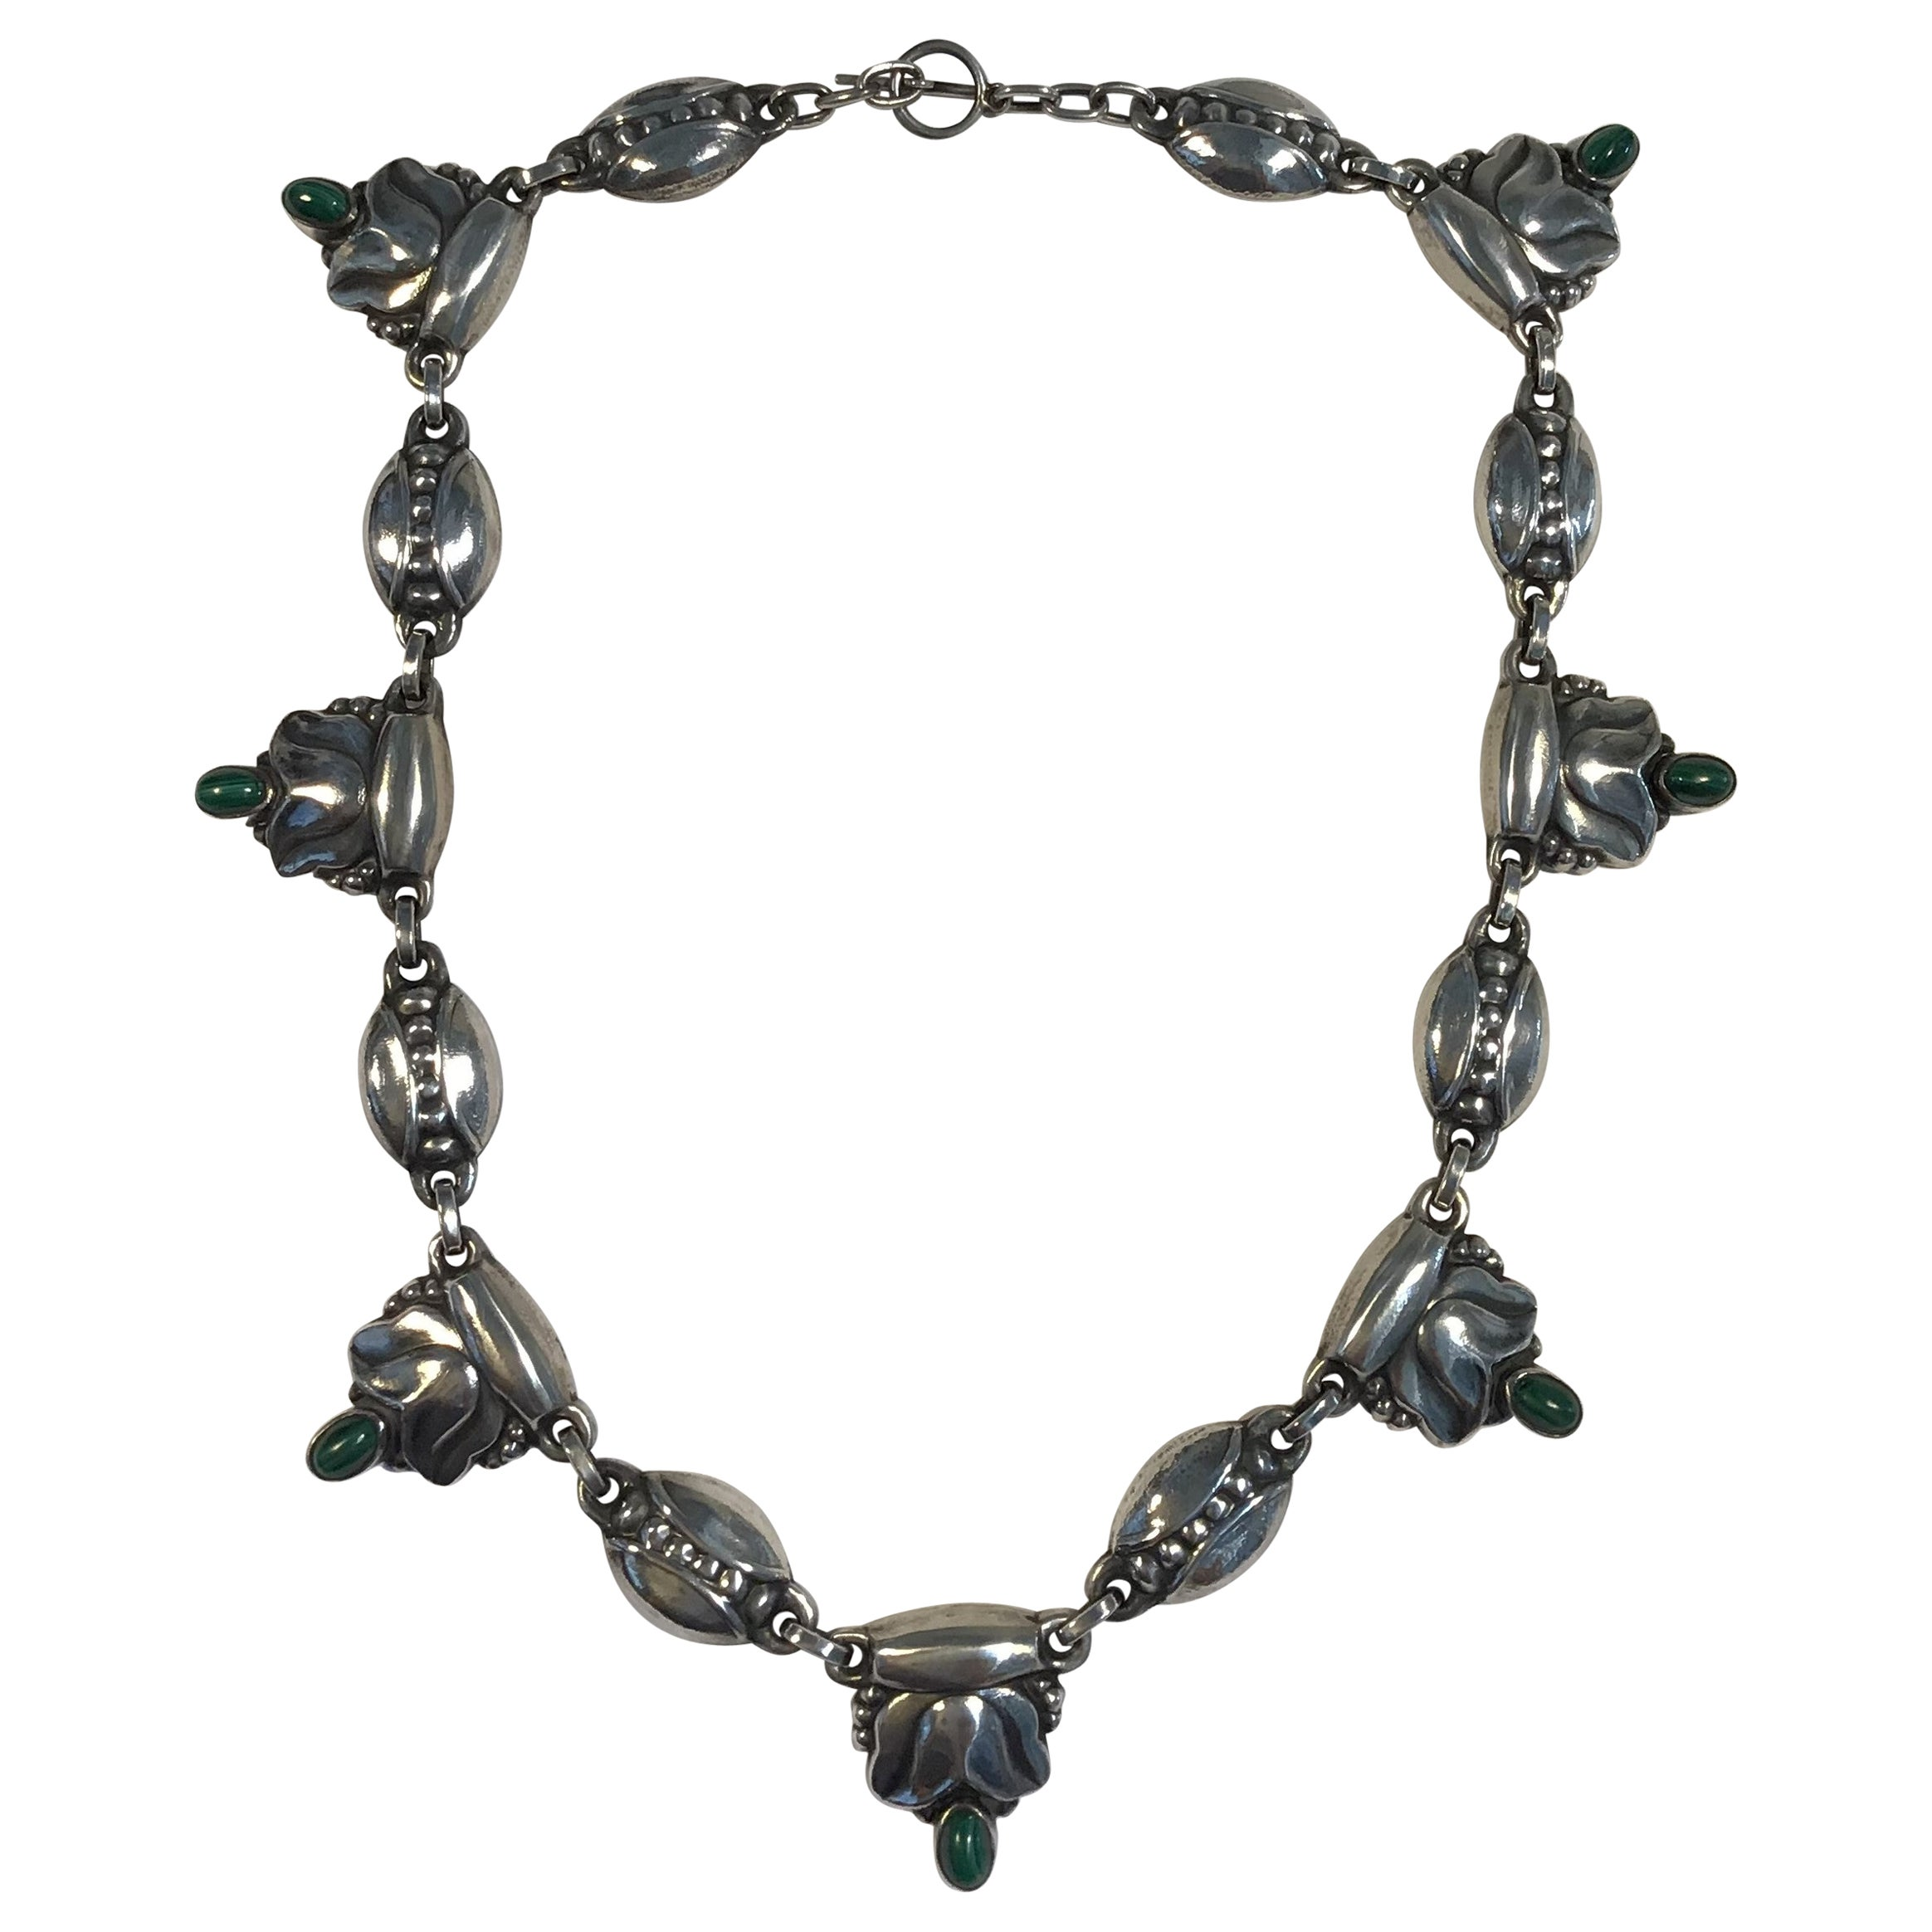 Georg Jensen Sterling Silver Necklace No. 3 Malachite